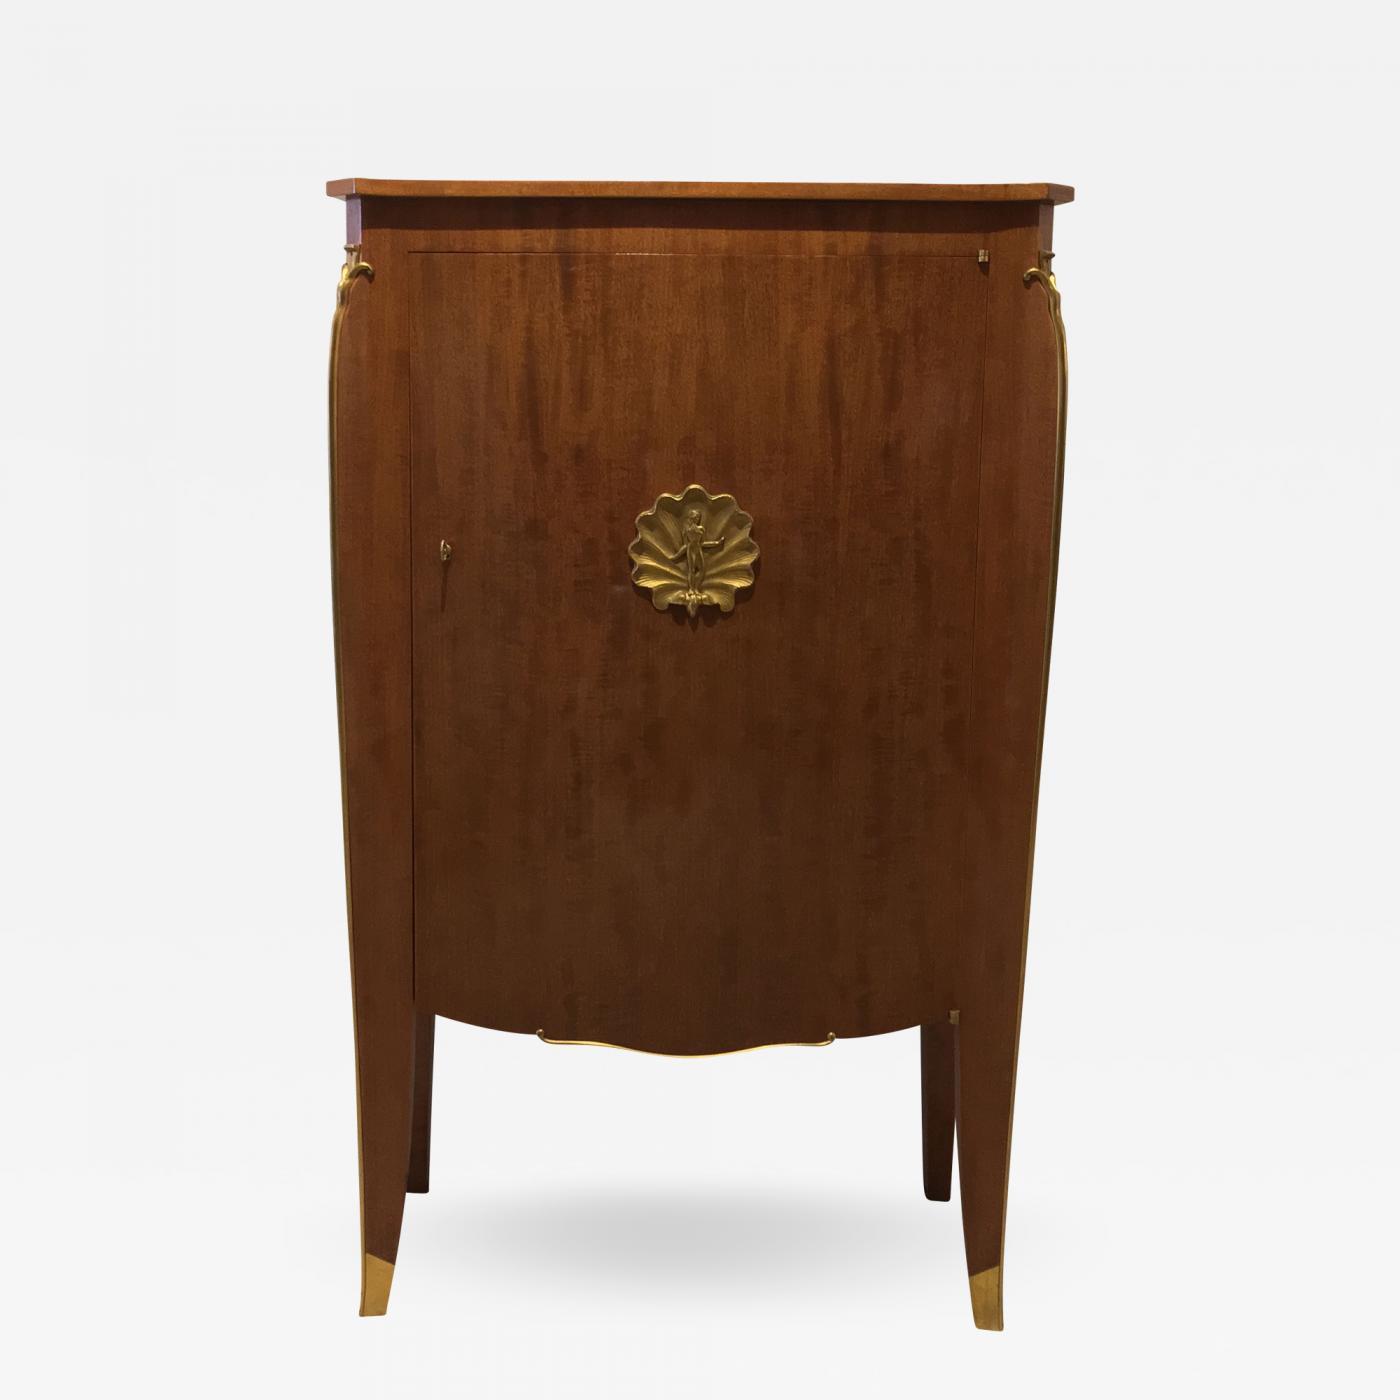 art moderne furniture. Listings / Furniture Case Pieces \u0026 Storage Cabinets · Jules Leleu French Art Moderne Mahogany Cabinet R